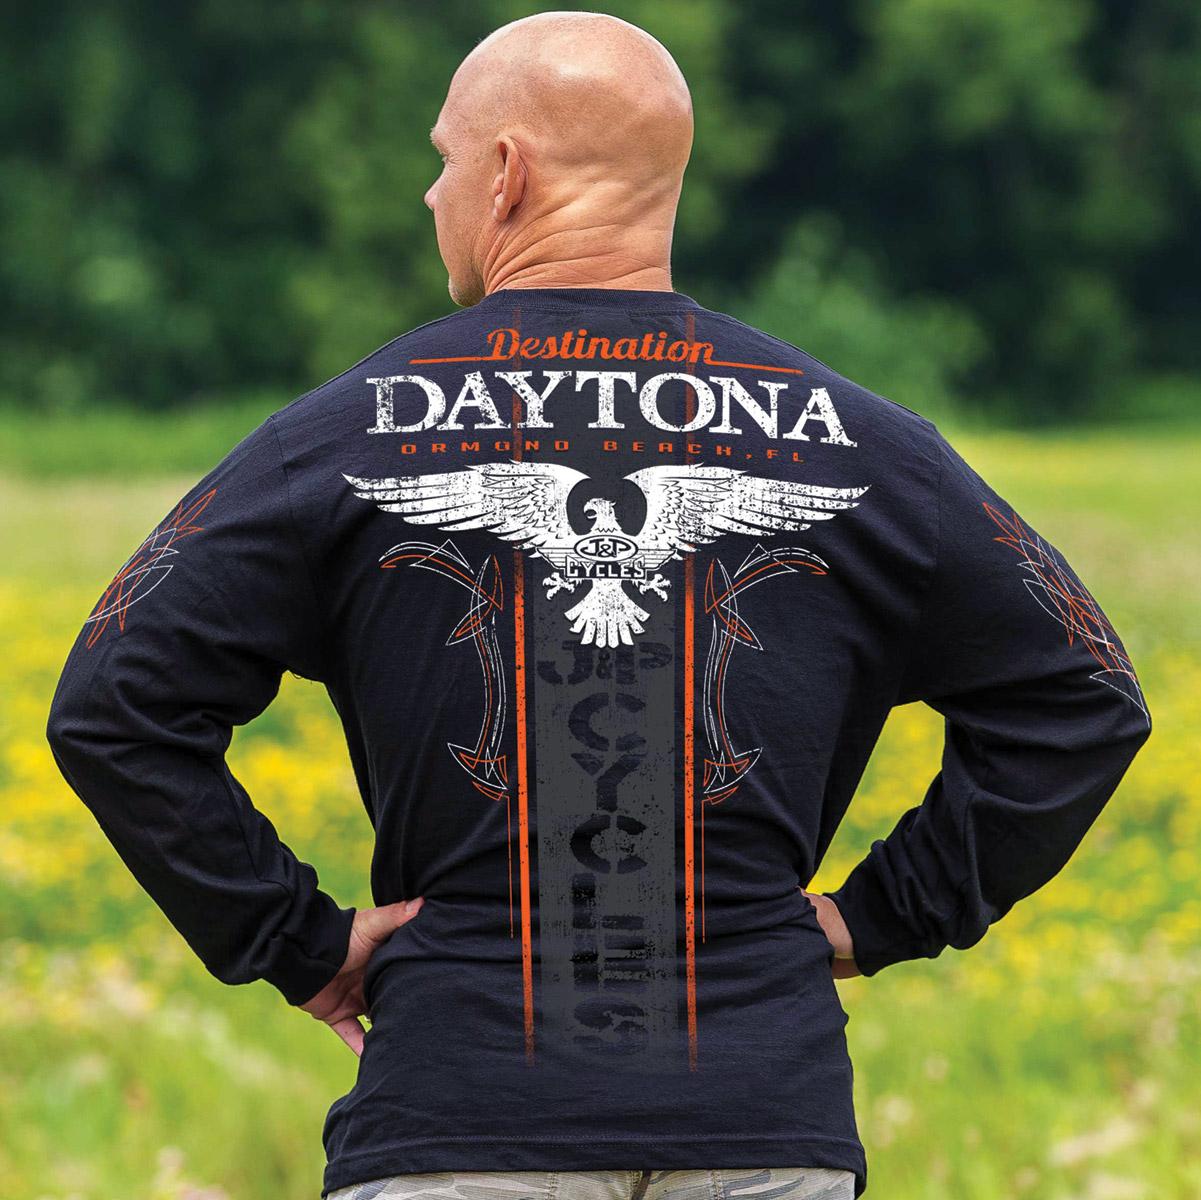 J&P Cycles® Daytona Winged Stripe Black Long-Sleeve T-Shirt